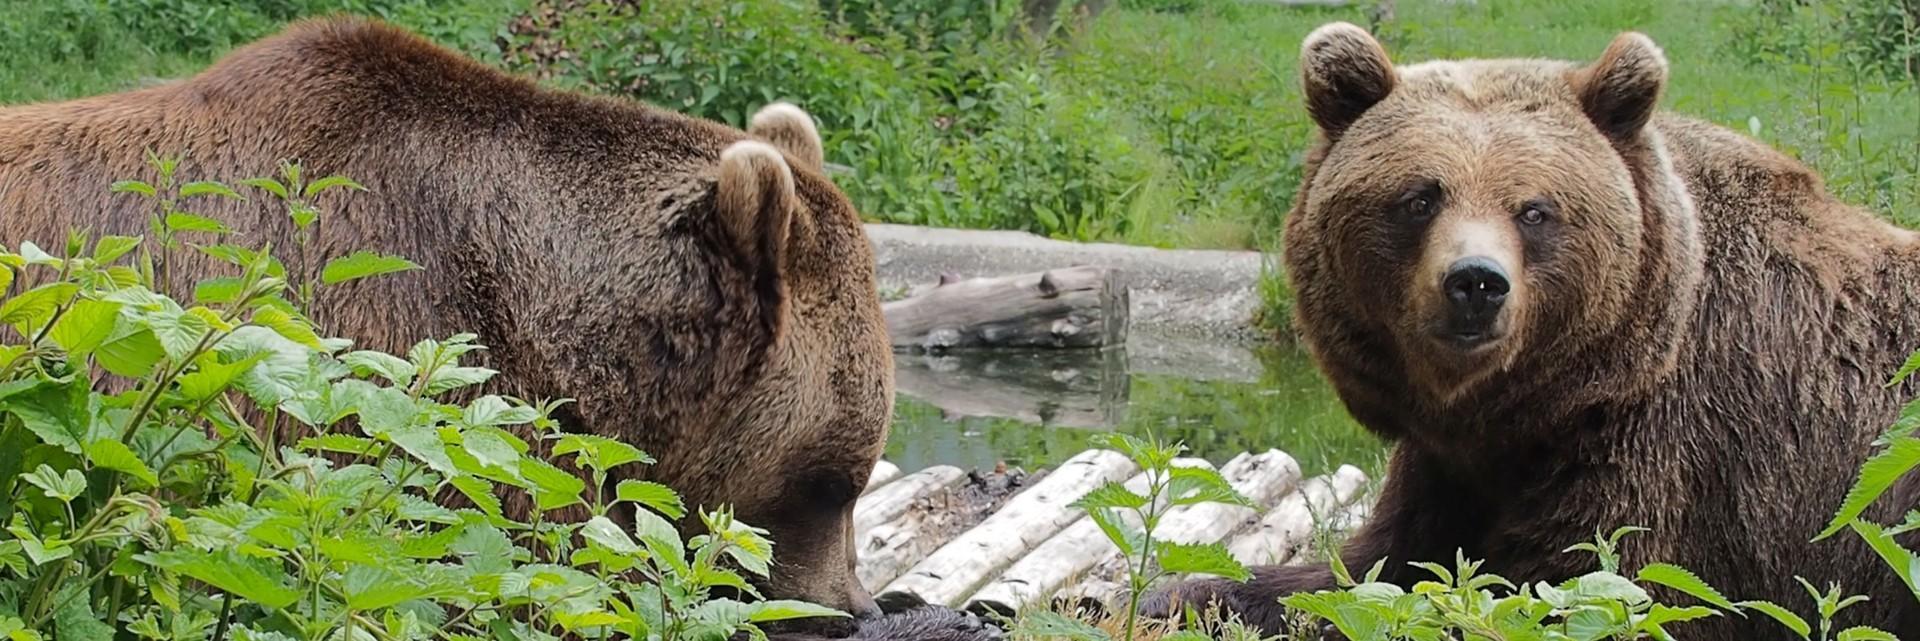 Bears at BEAR SANCATURY Arbesbach